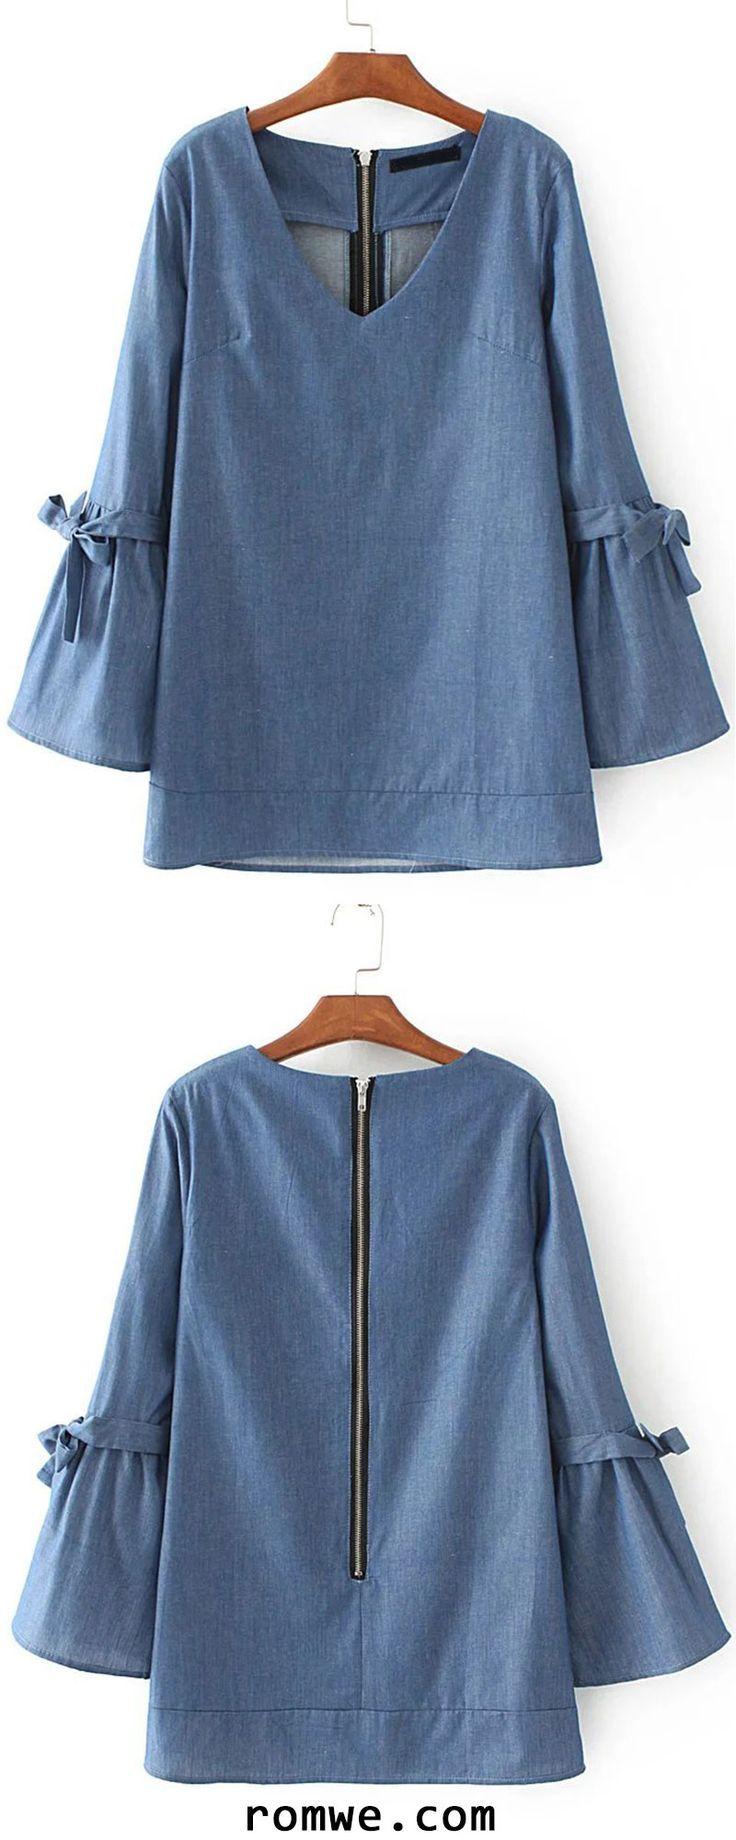 Blue V Neck Tie Detail Zipper Back Denim Blouse - blouses 82d1ebc02e060